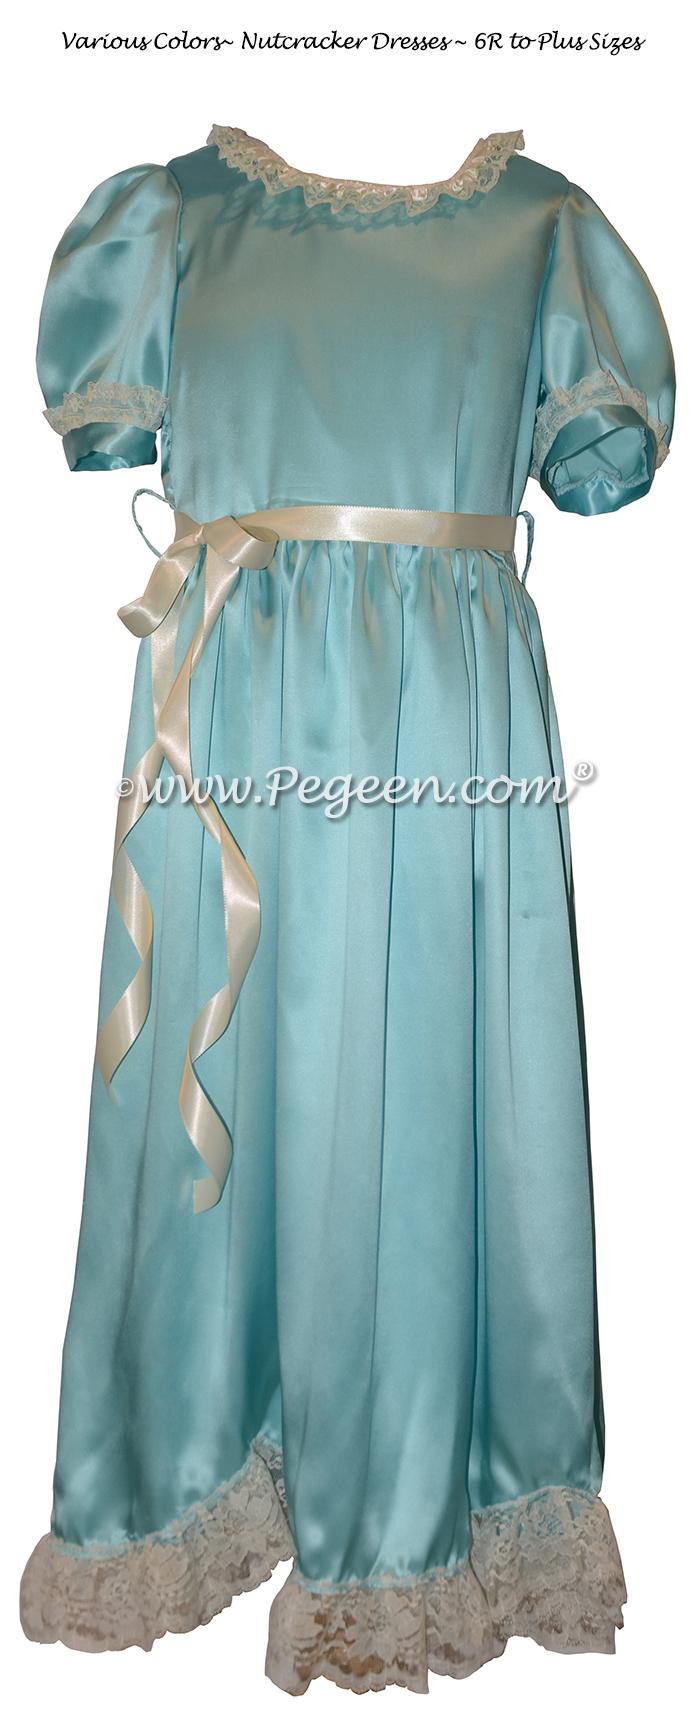 Clara Nutcracker Nightgown Dress in Turquoise Charmeuse Silk